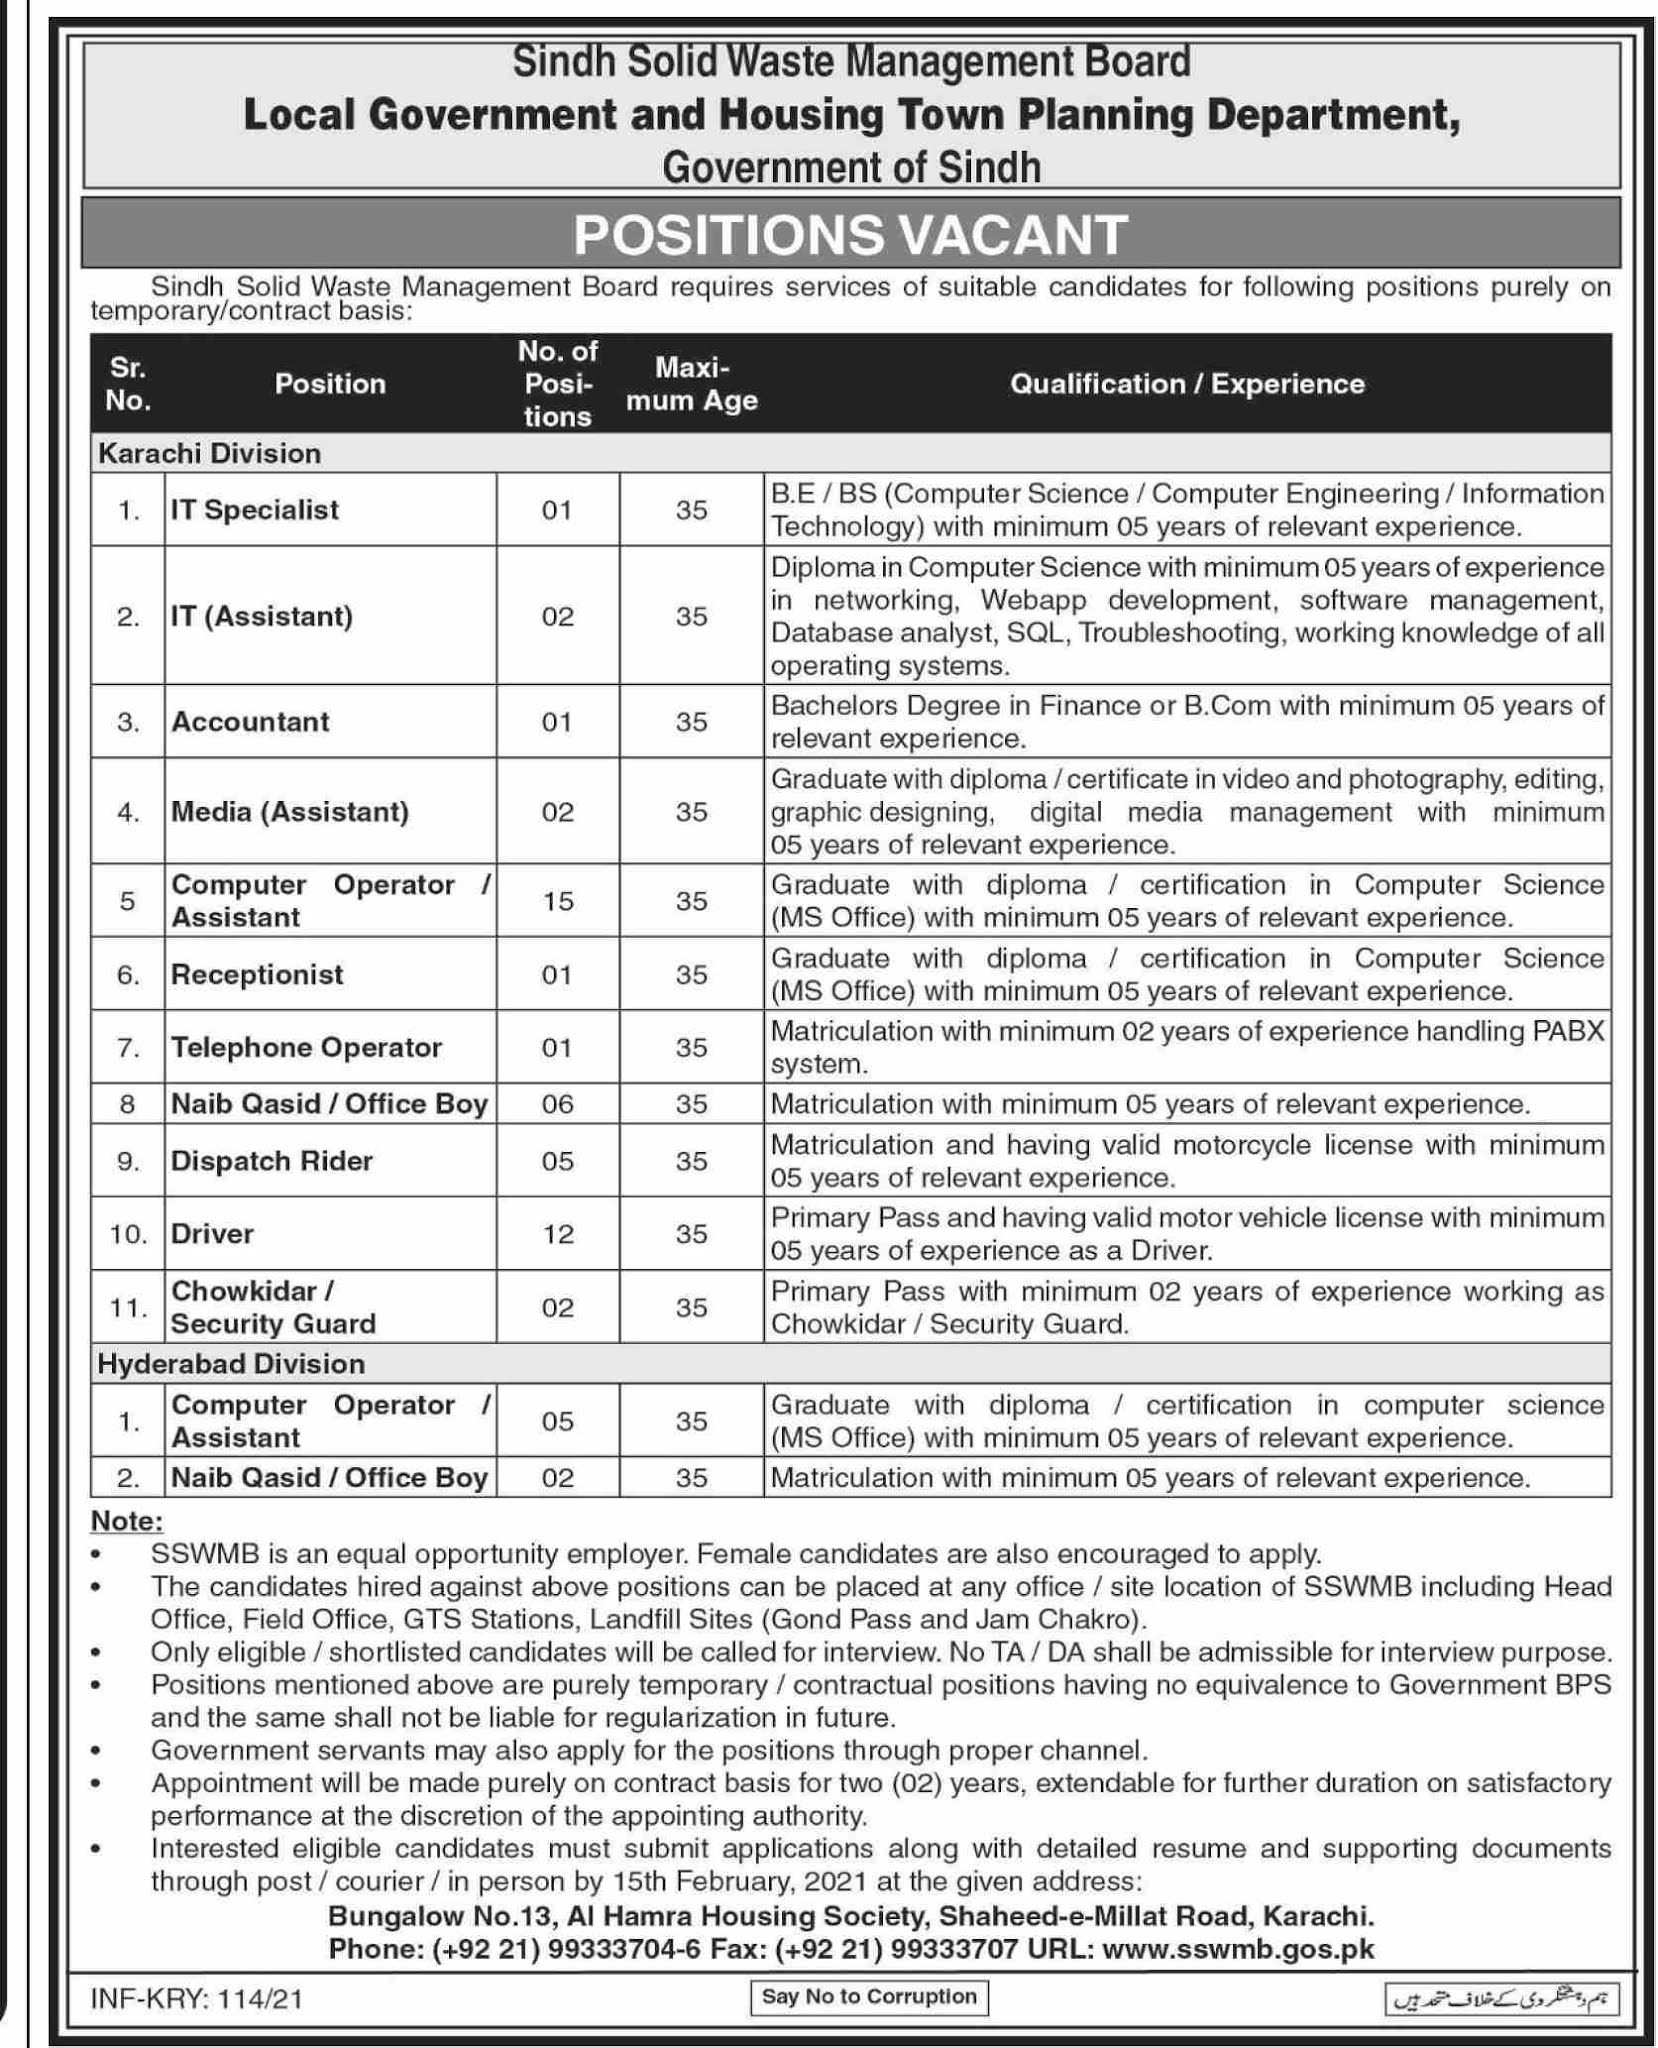 Sindh Solid Waste Management Board Jobs 2021 - SSWMB Jobs 2021 - Latest Govt Jobs 2021 - Trending Jobs in Pakistan 2021